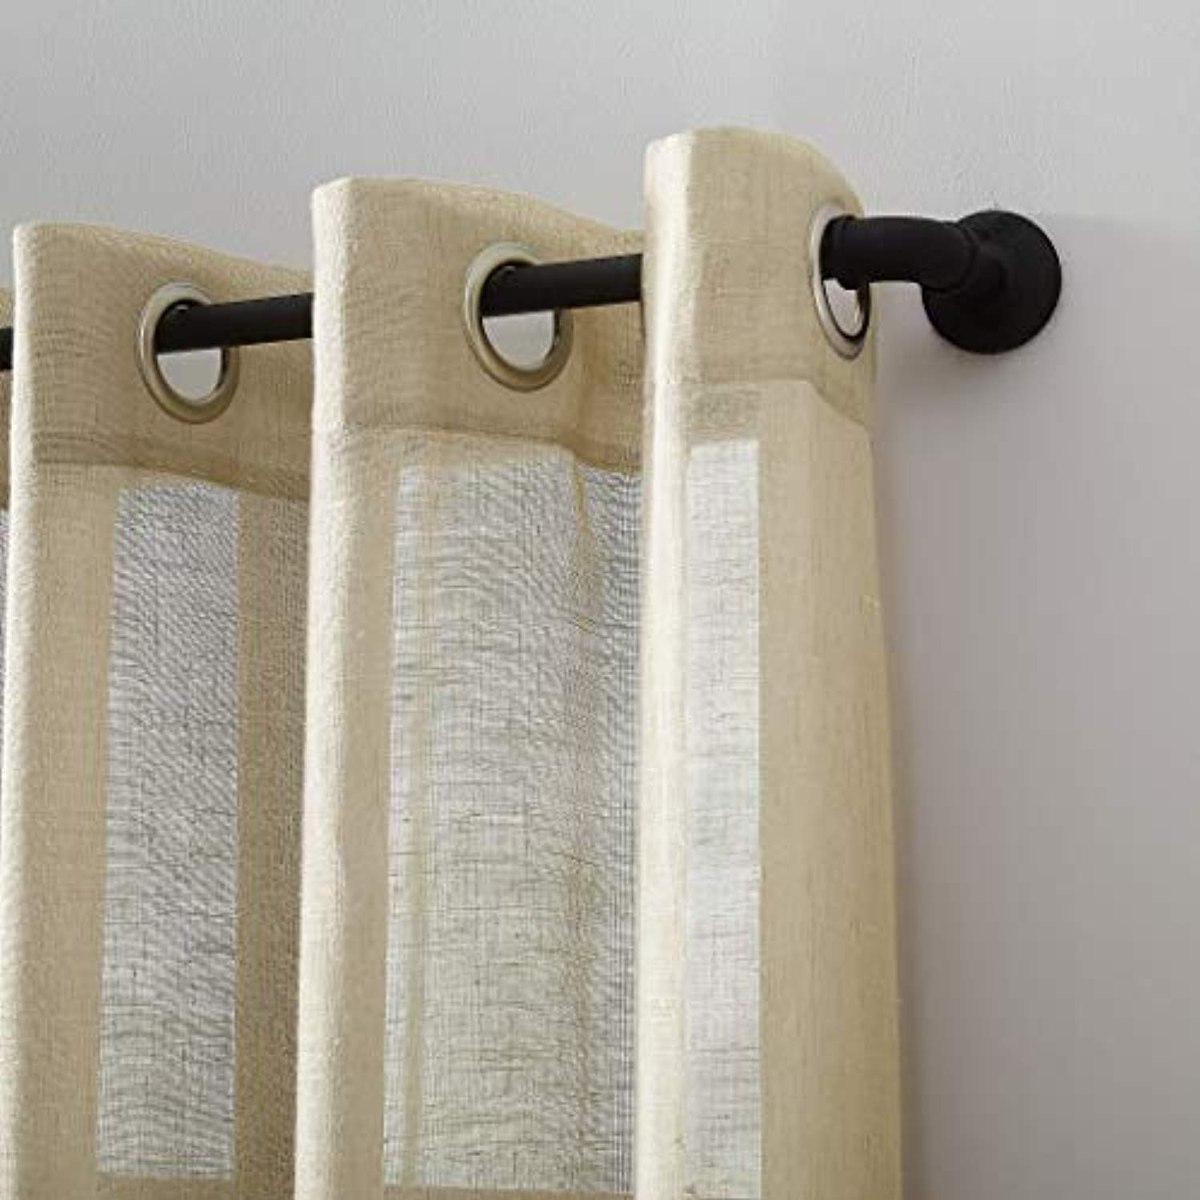 Archaeo Slub Textured Linen Blend Grommet For Archaeo Slub Textured Linen Blend Grommet Top Curtains (View 10 of 20)